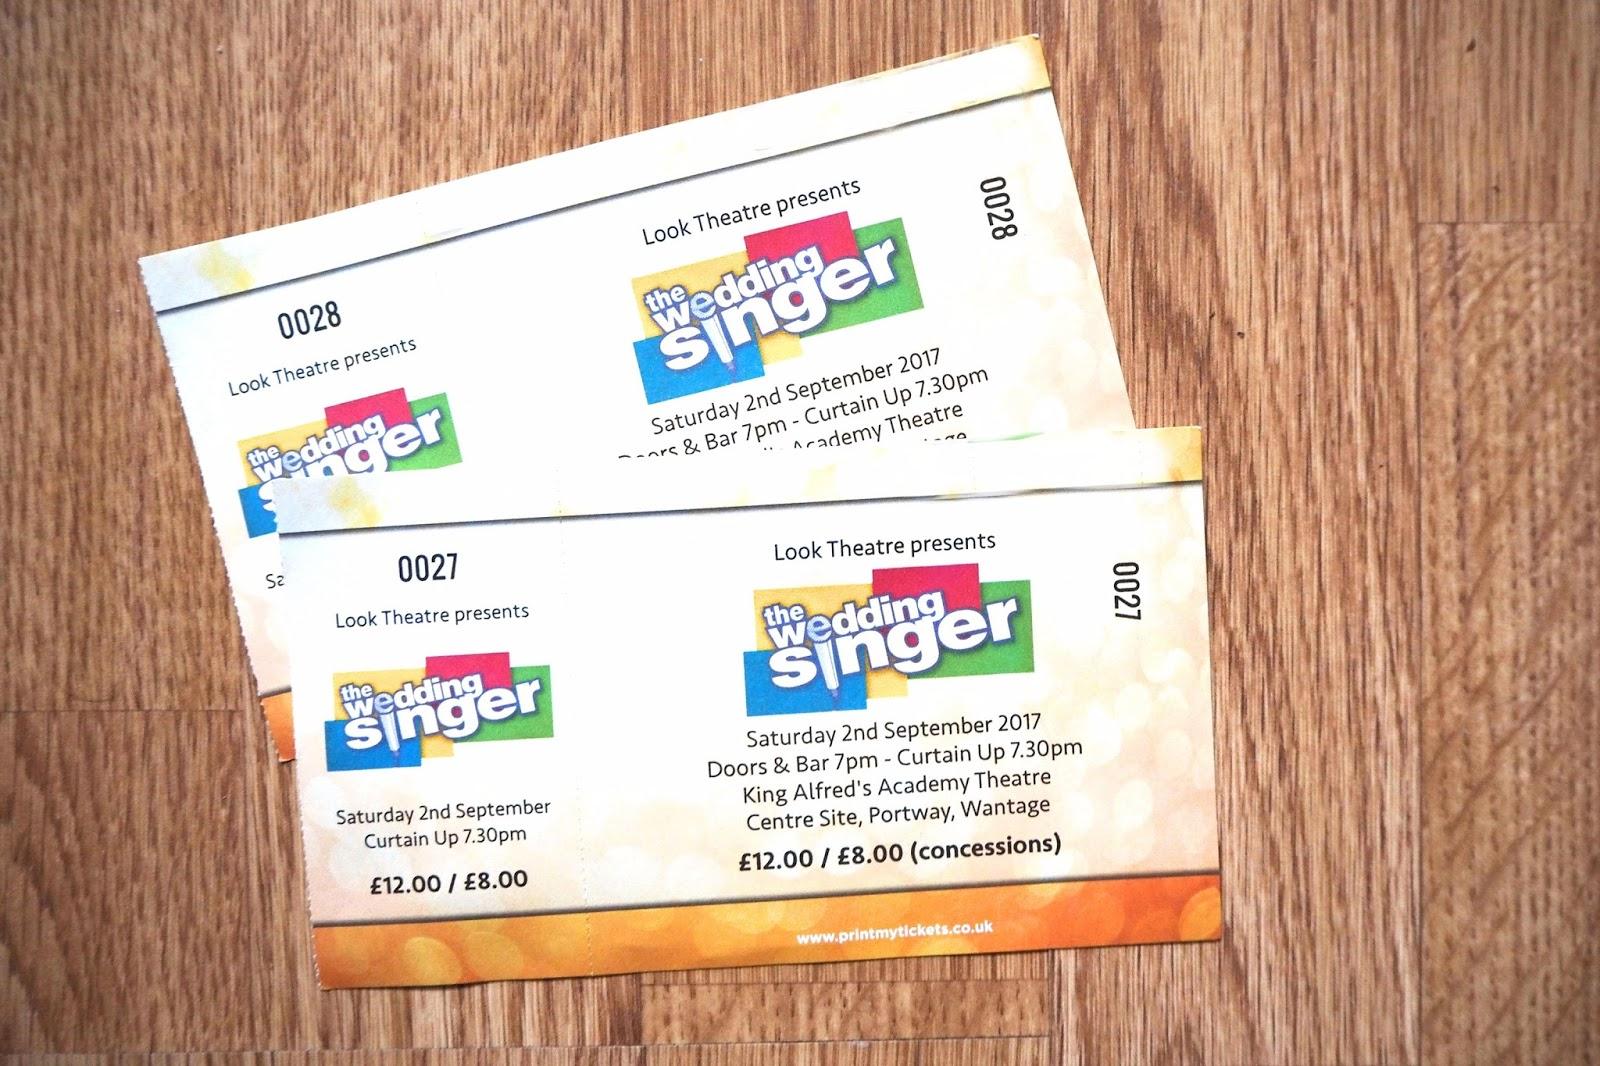 The Wedding Singer tickets